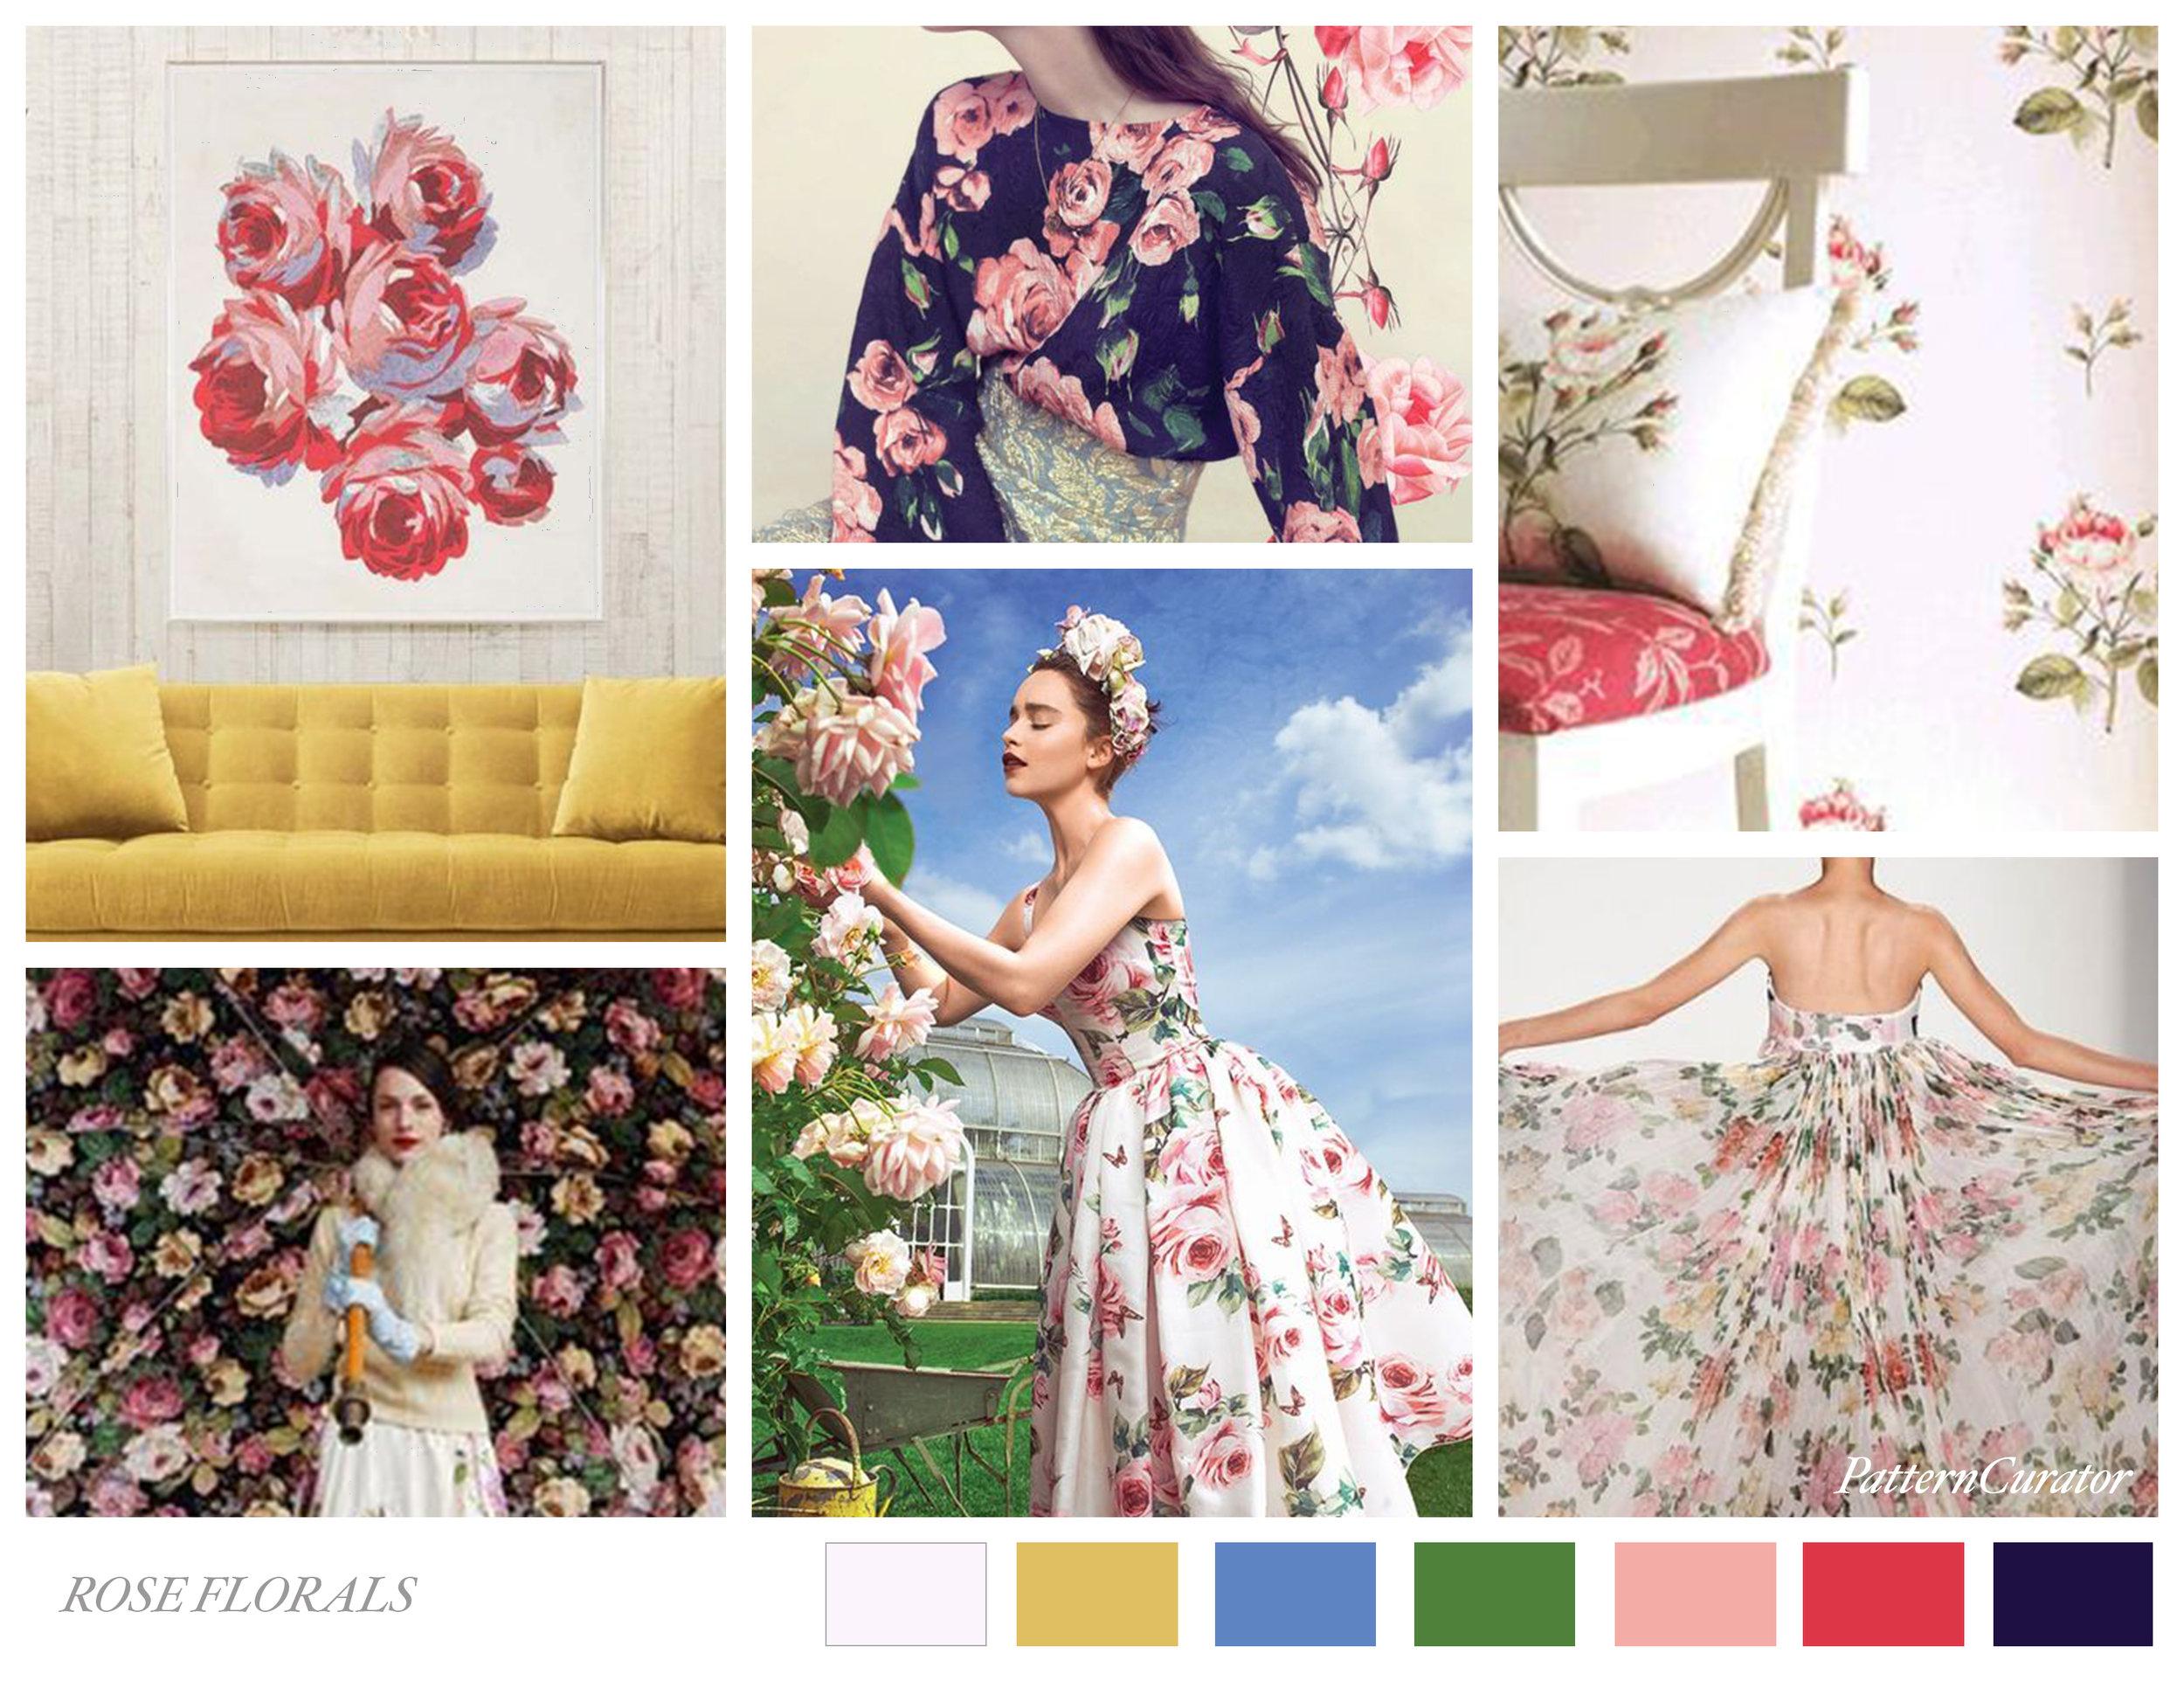 ROSE-FLORALS-print.jpg